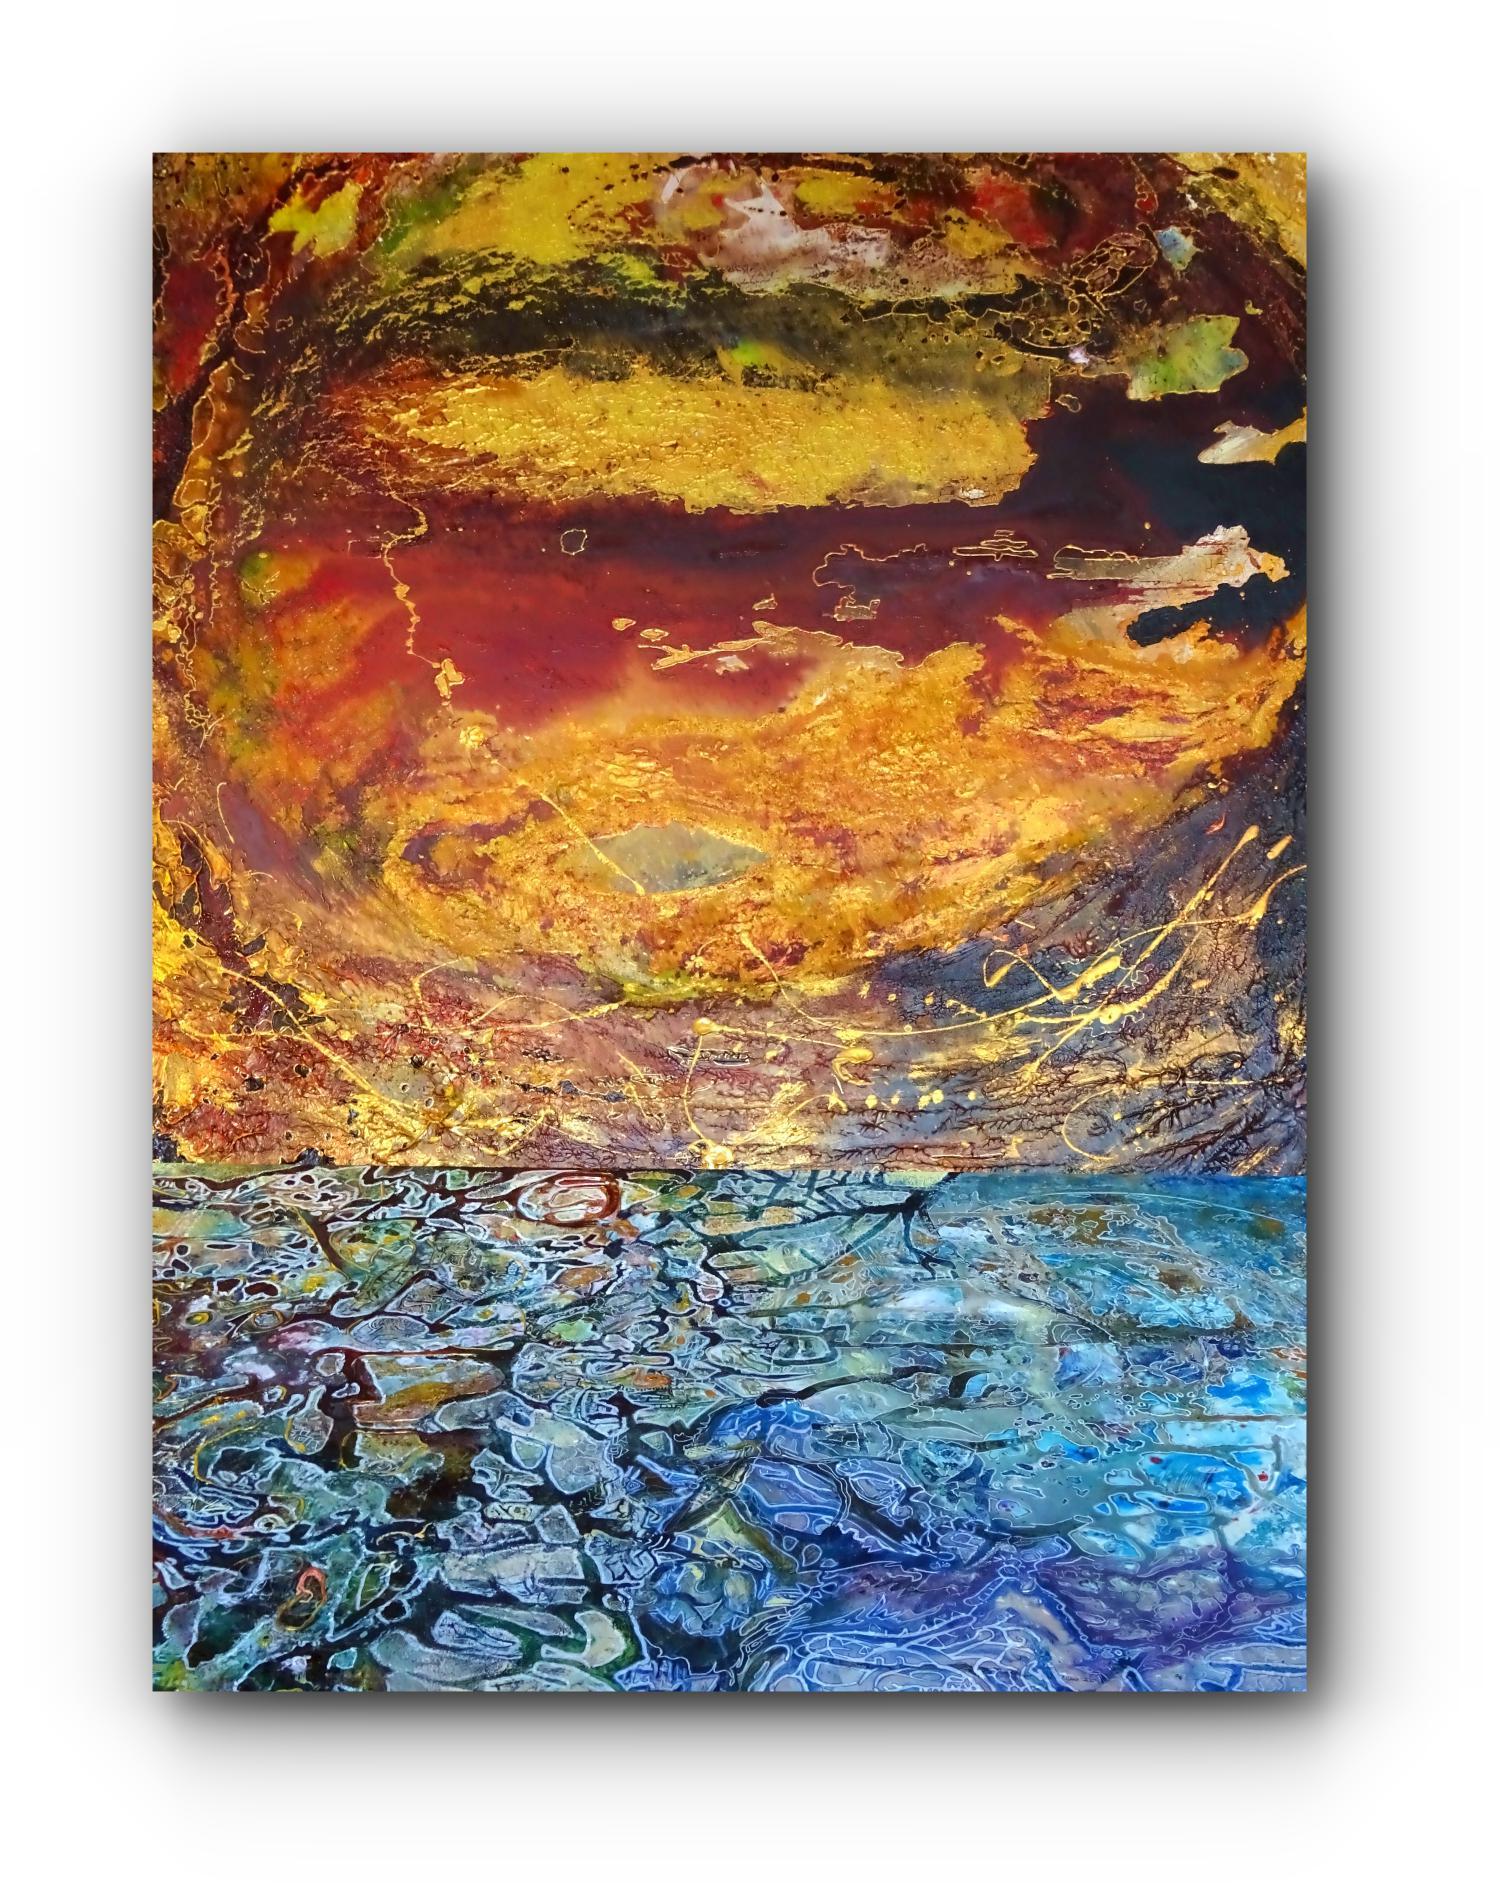 painting-sunrise-over-ocean-artist-duo-ingress-vortices.jpg